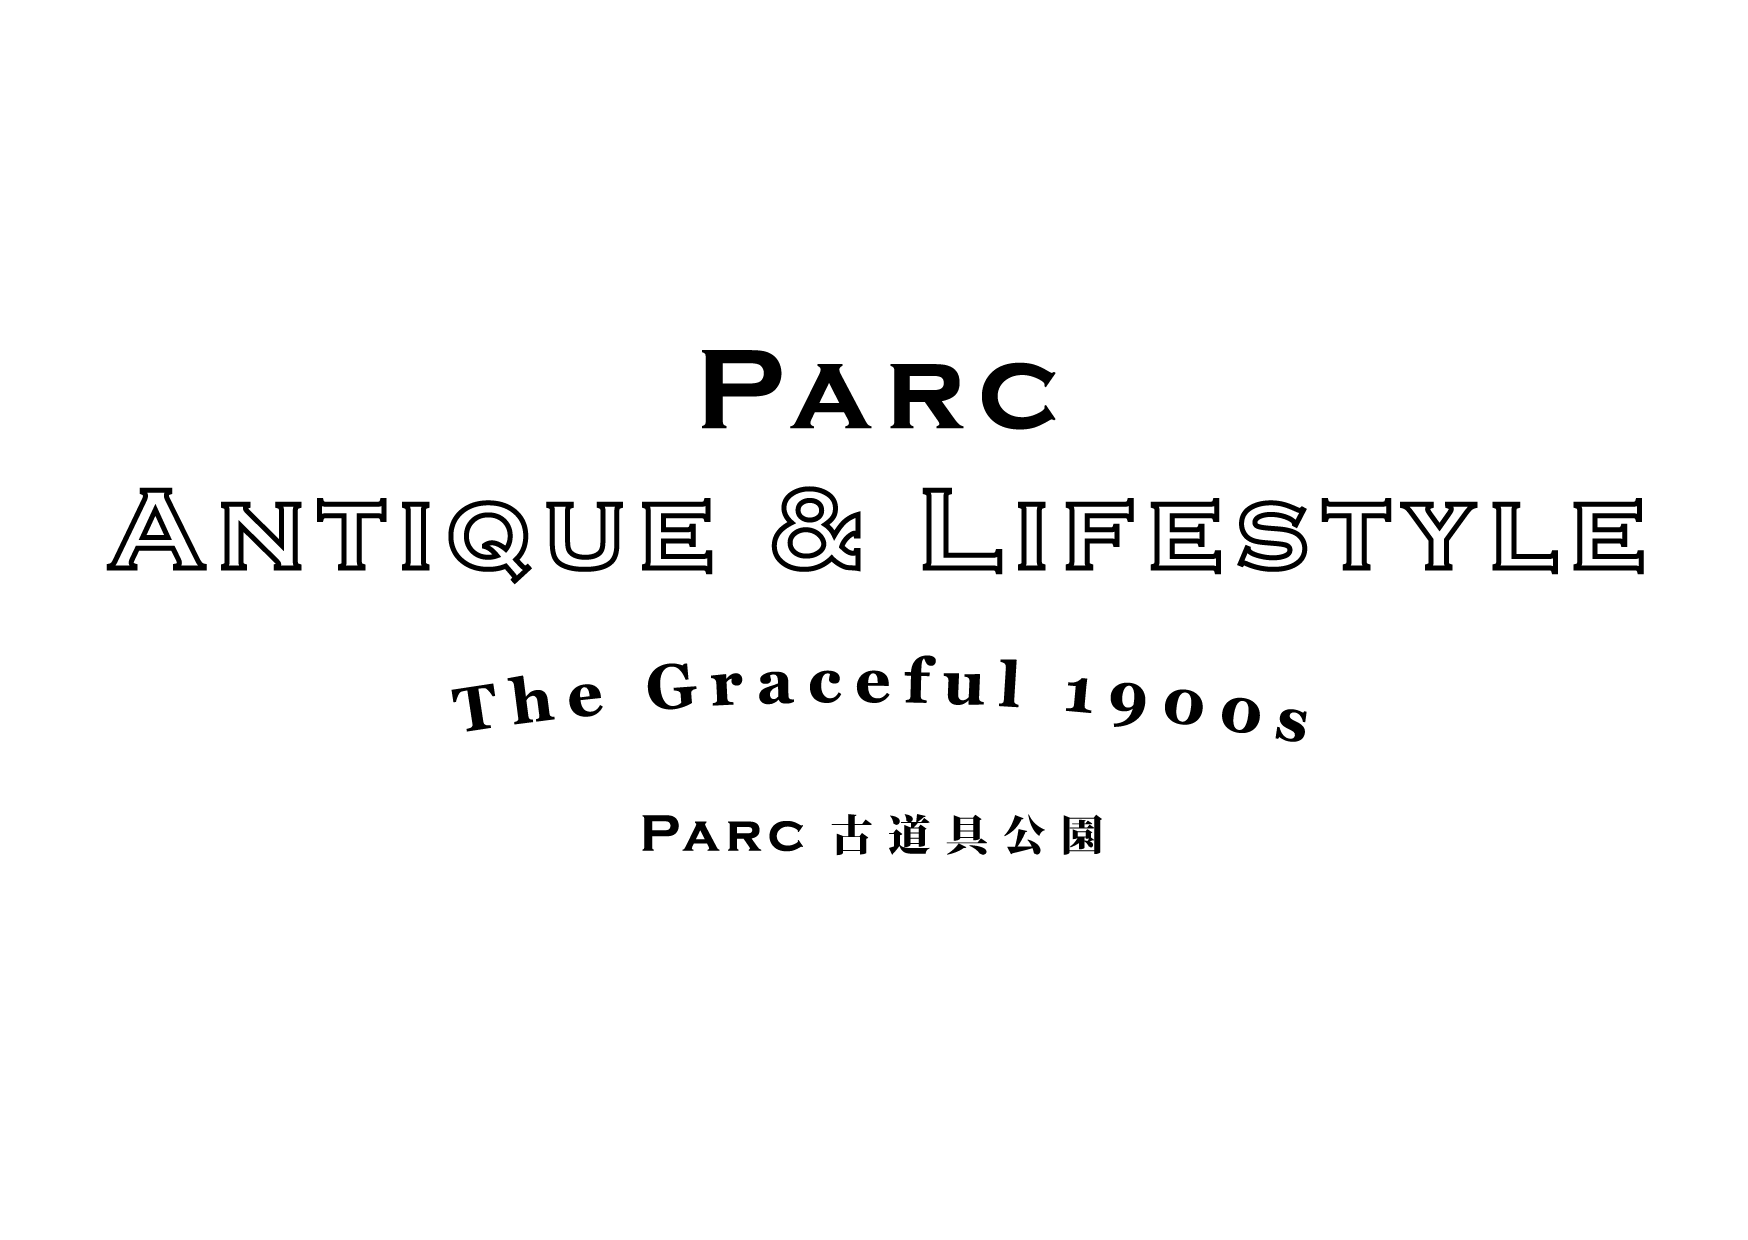 parclogo_2018-01.png